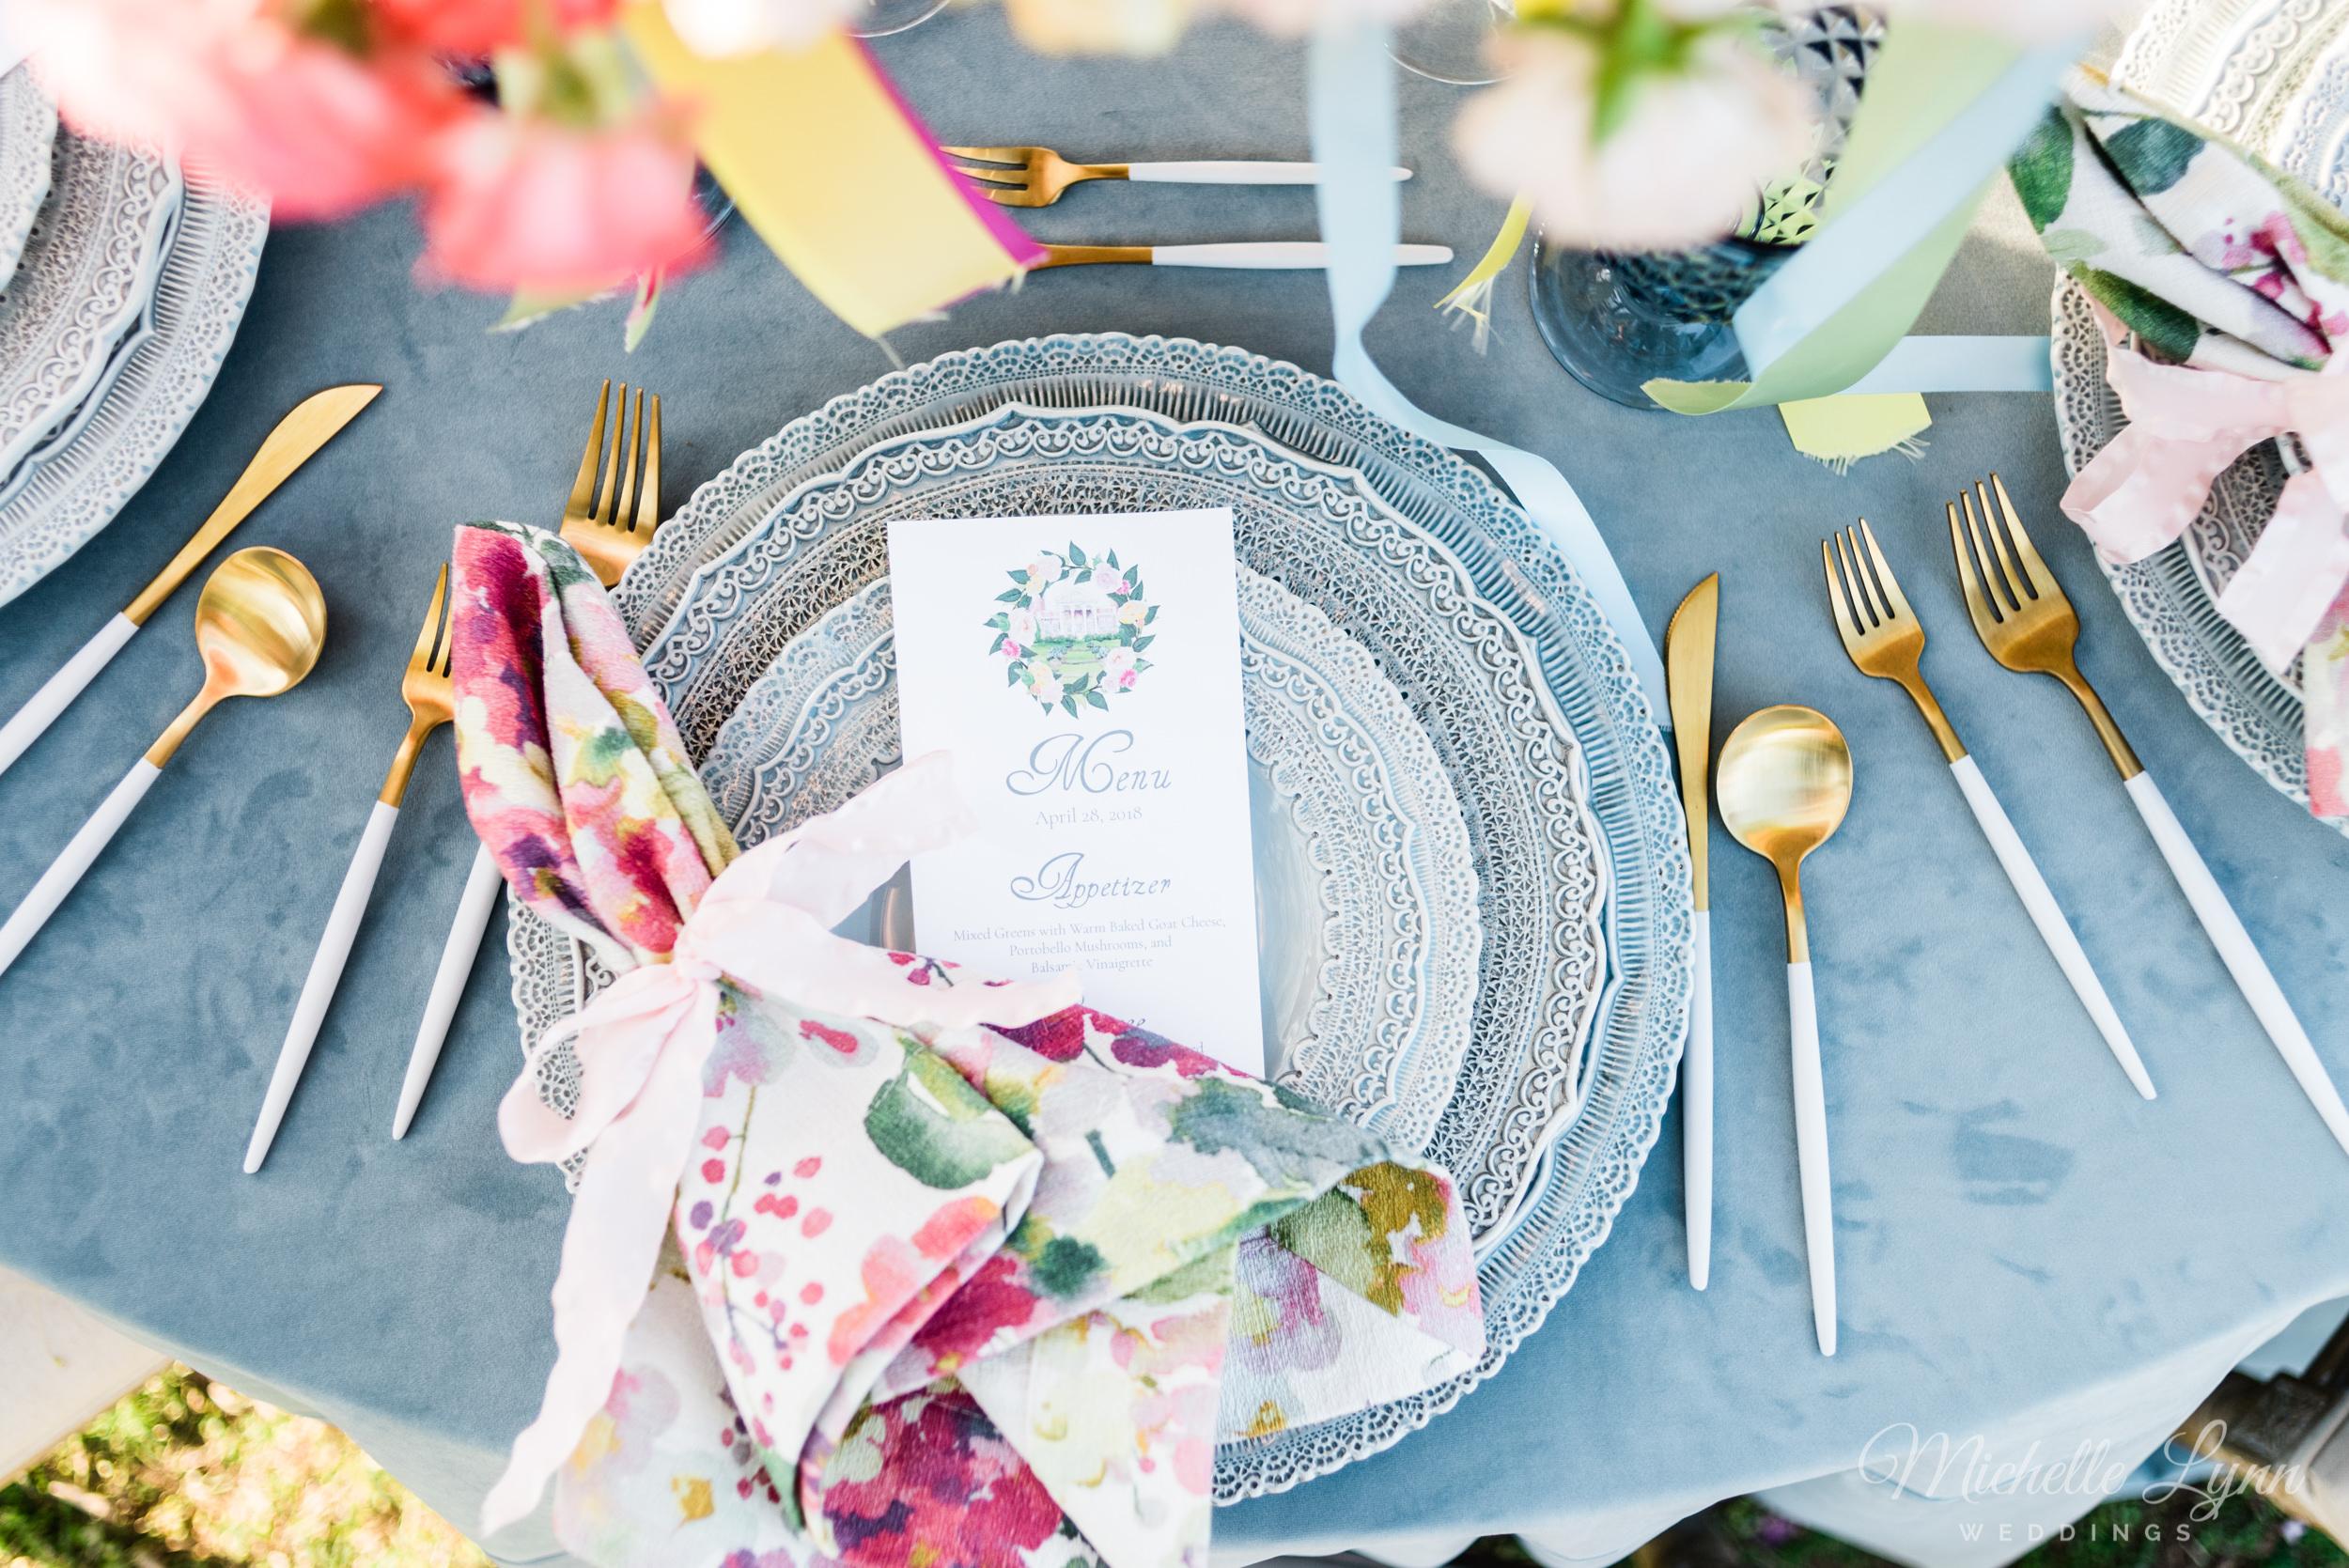 mlw-whitehall-annapolis-maryland-wedding-21.jpg